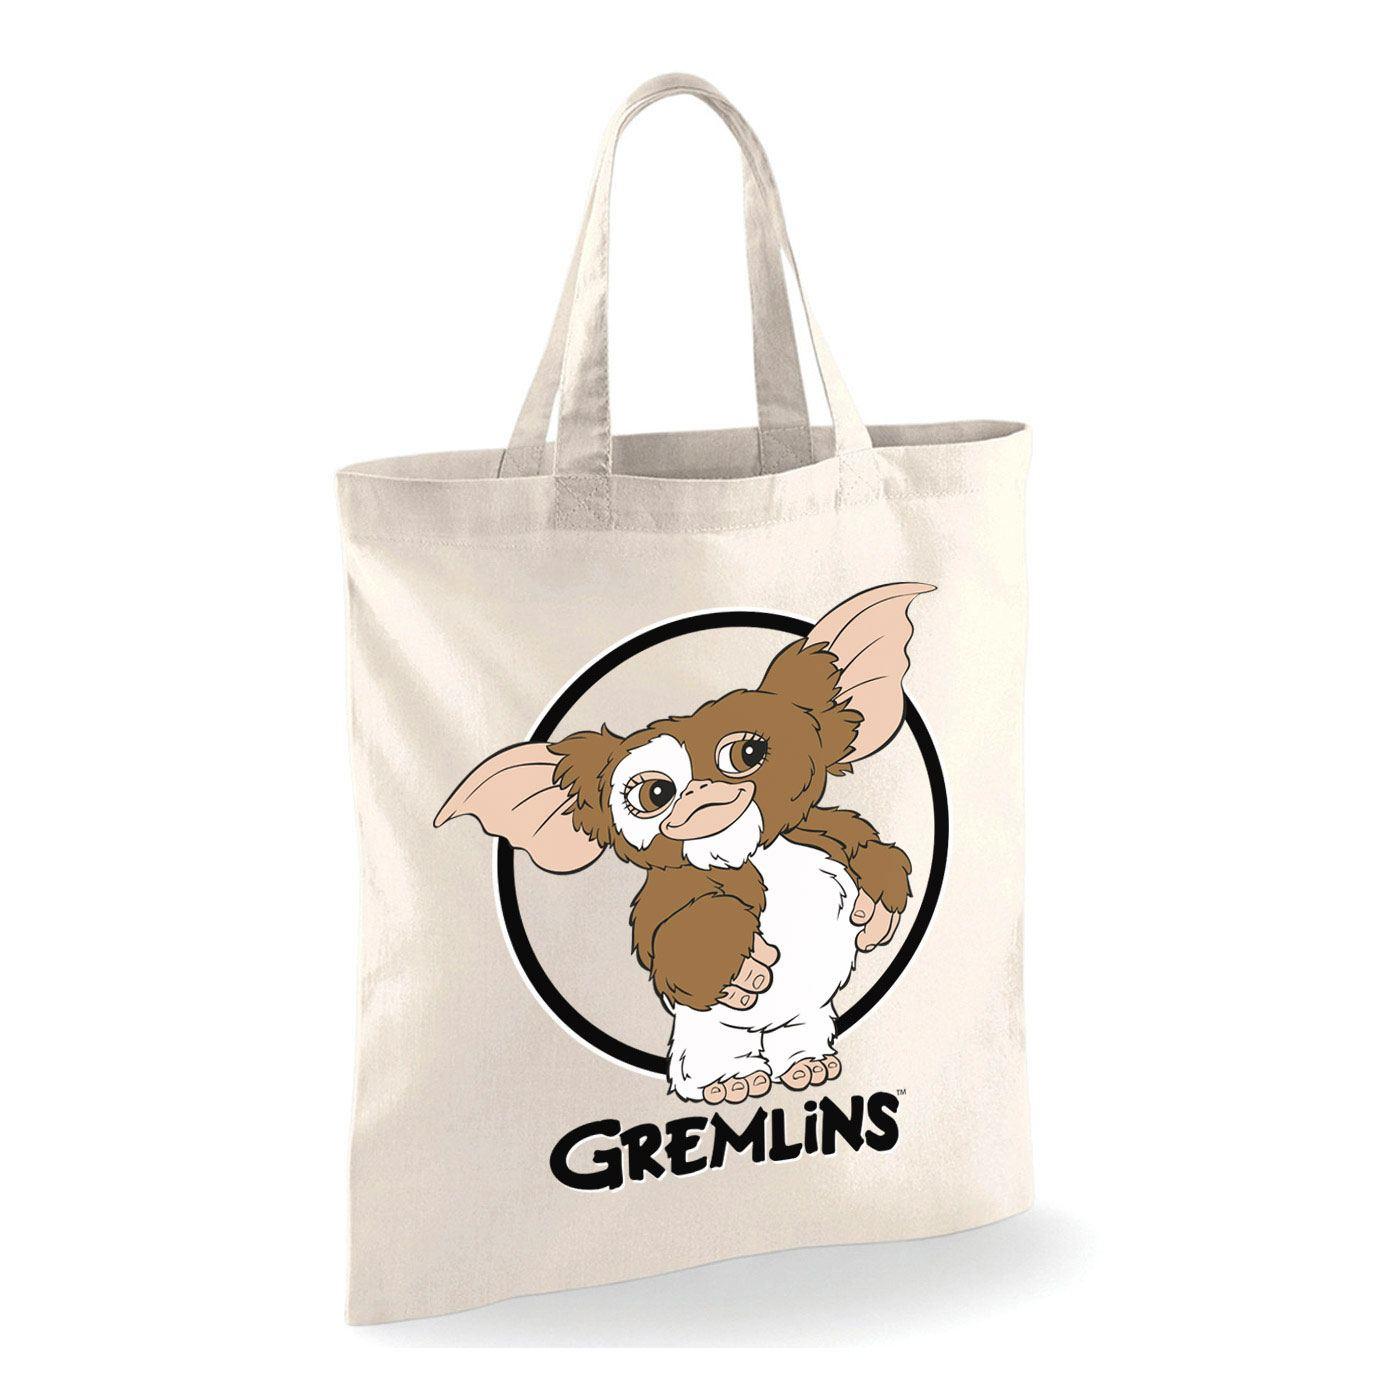 Gremlins Tote Bag Gizmo